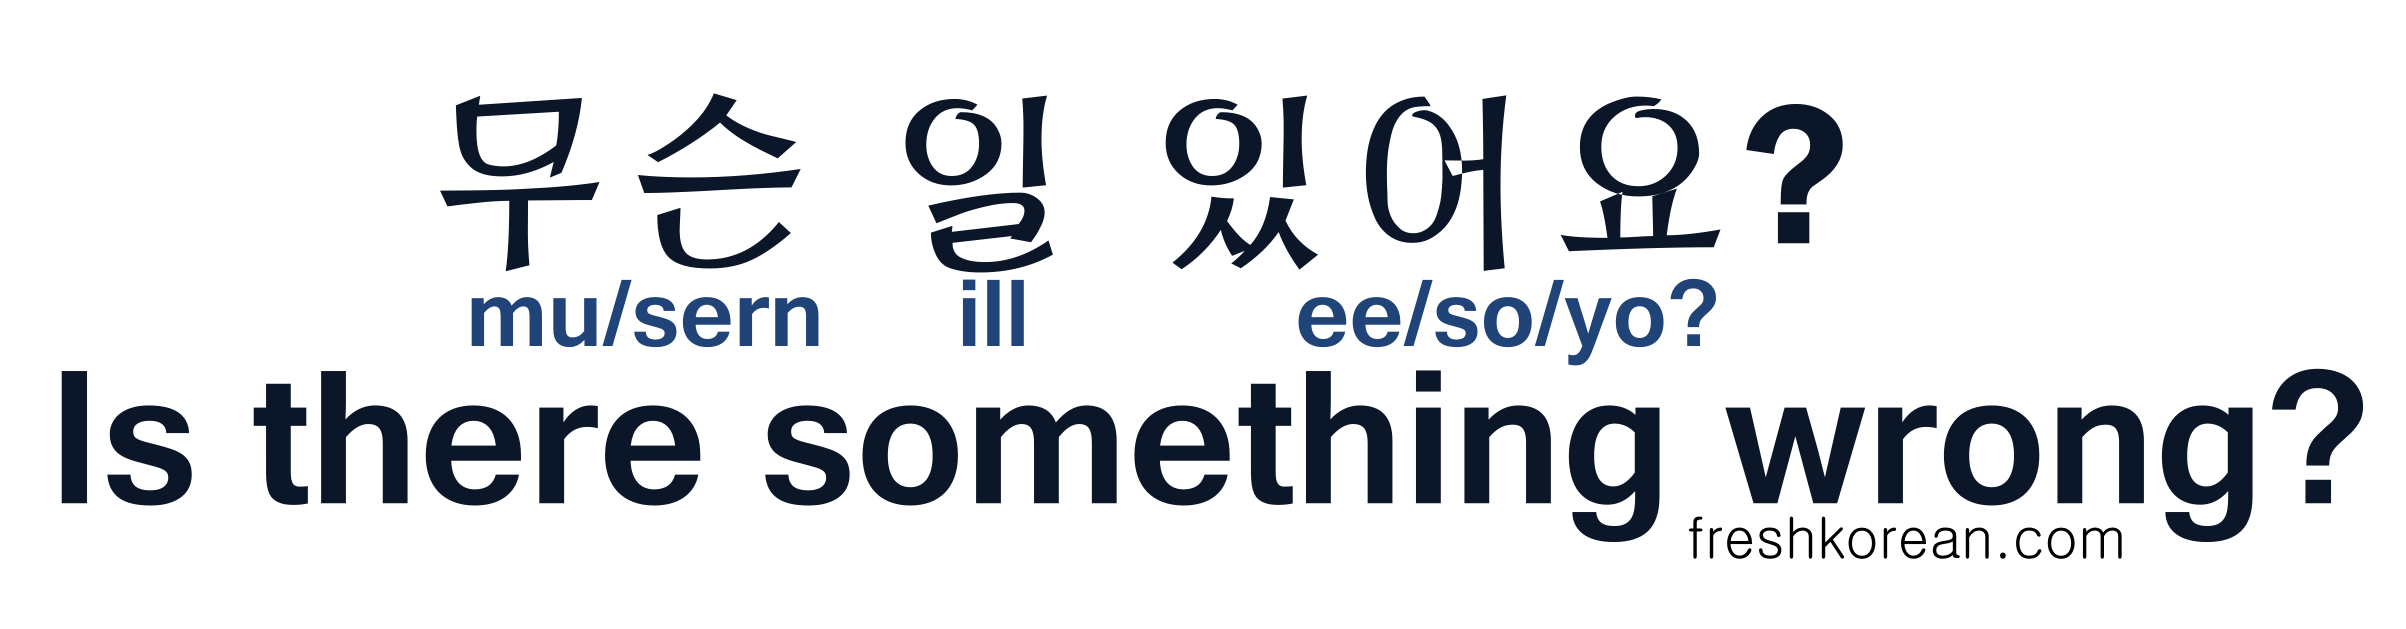 Everyday Korean Phrases Fresh Korean